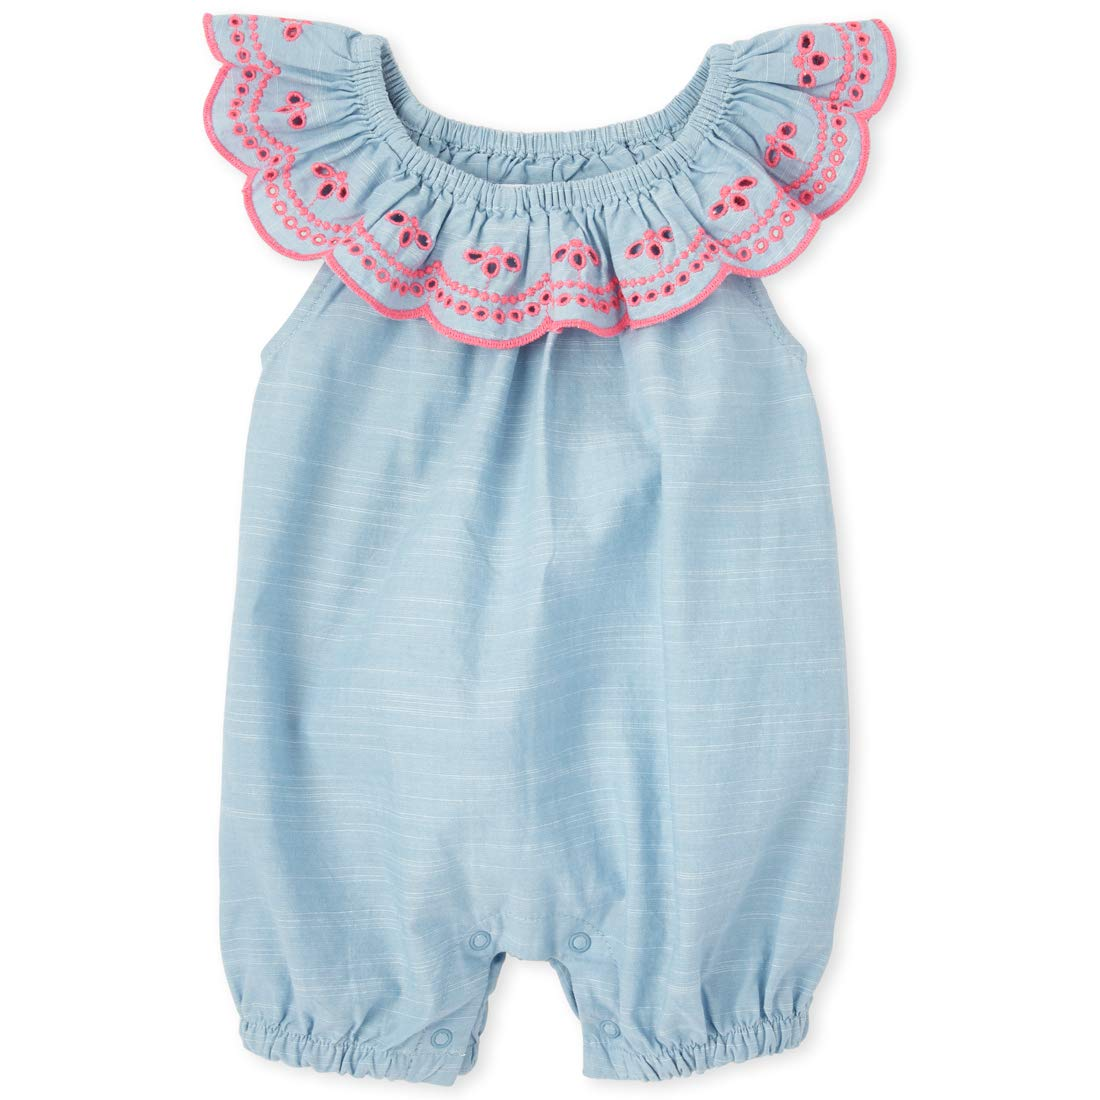 The Children's Place Baby Girls' Sleeveless Romper